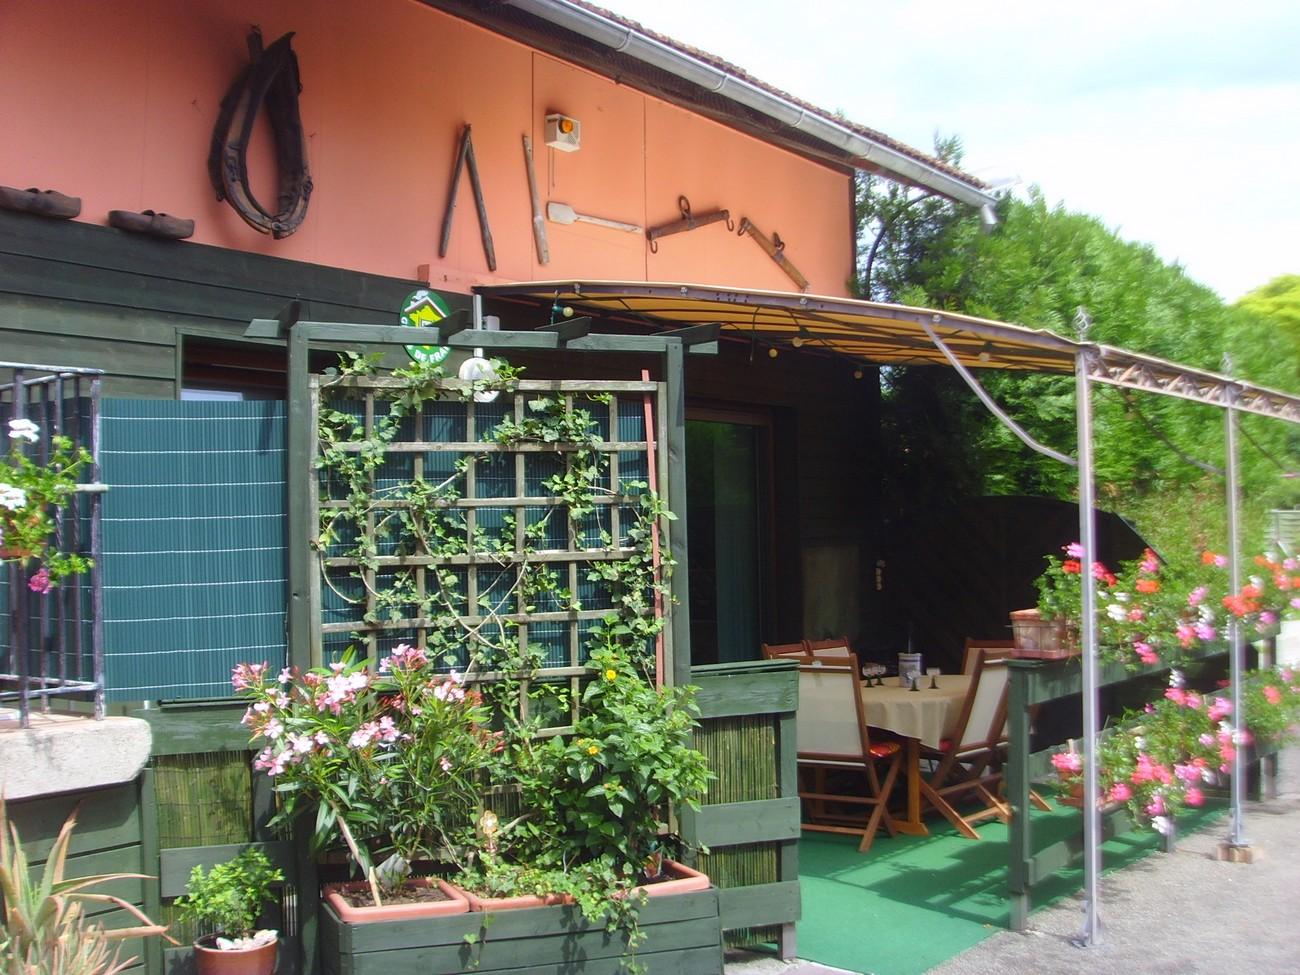 Furnished accomodation Mr Jean-Louis BURGI - le jardinier